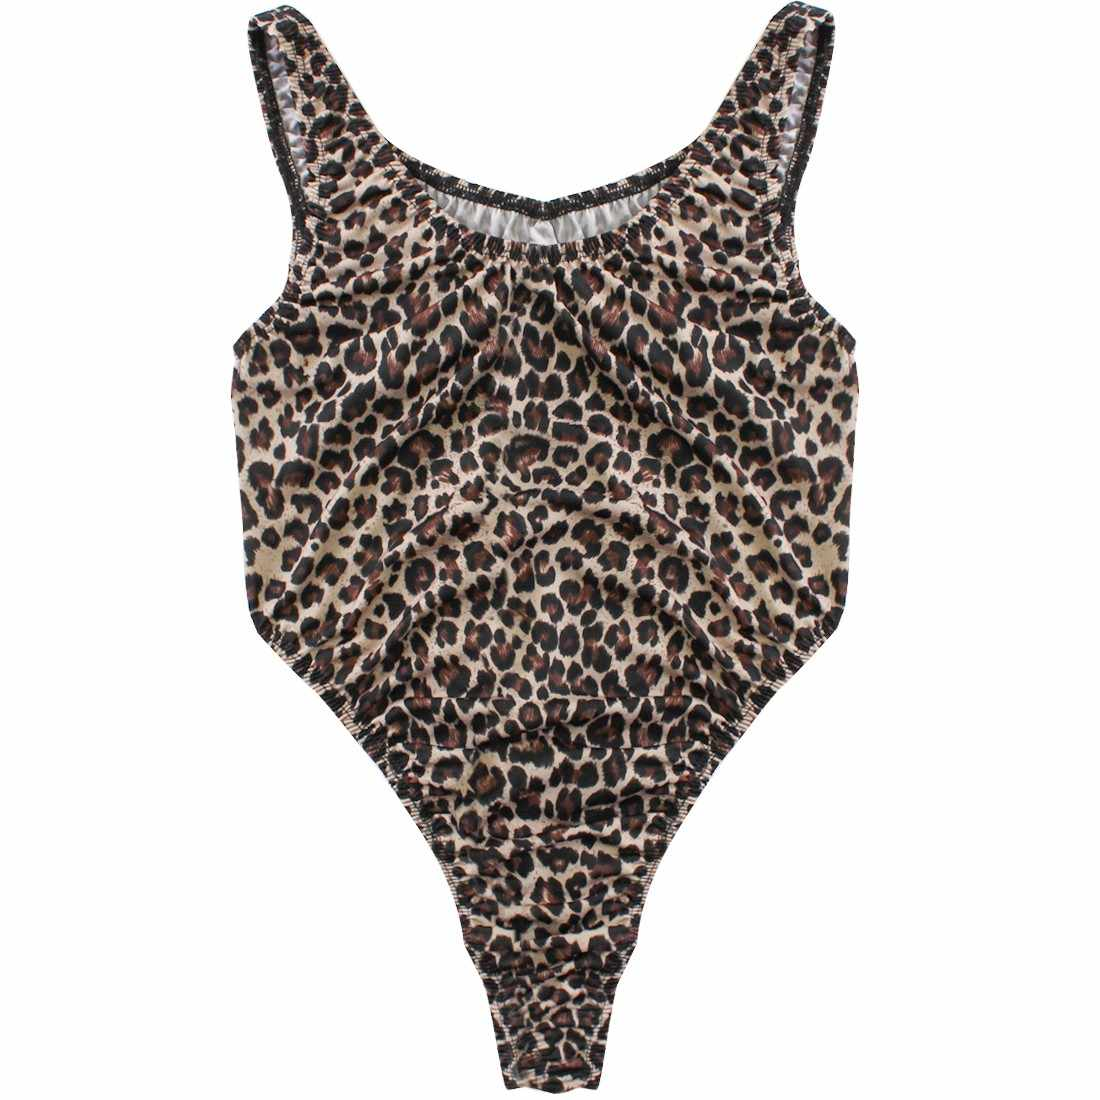 7d4d051e2b ... Leopard Bodysuit Women Sleeveless Sexy One Piece Swimsuit High Cut  Thong Leotard Lady Gymnastics Dancewear Party ...